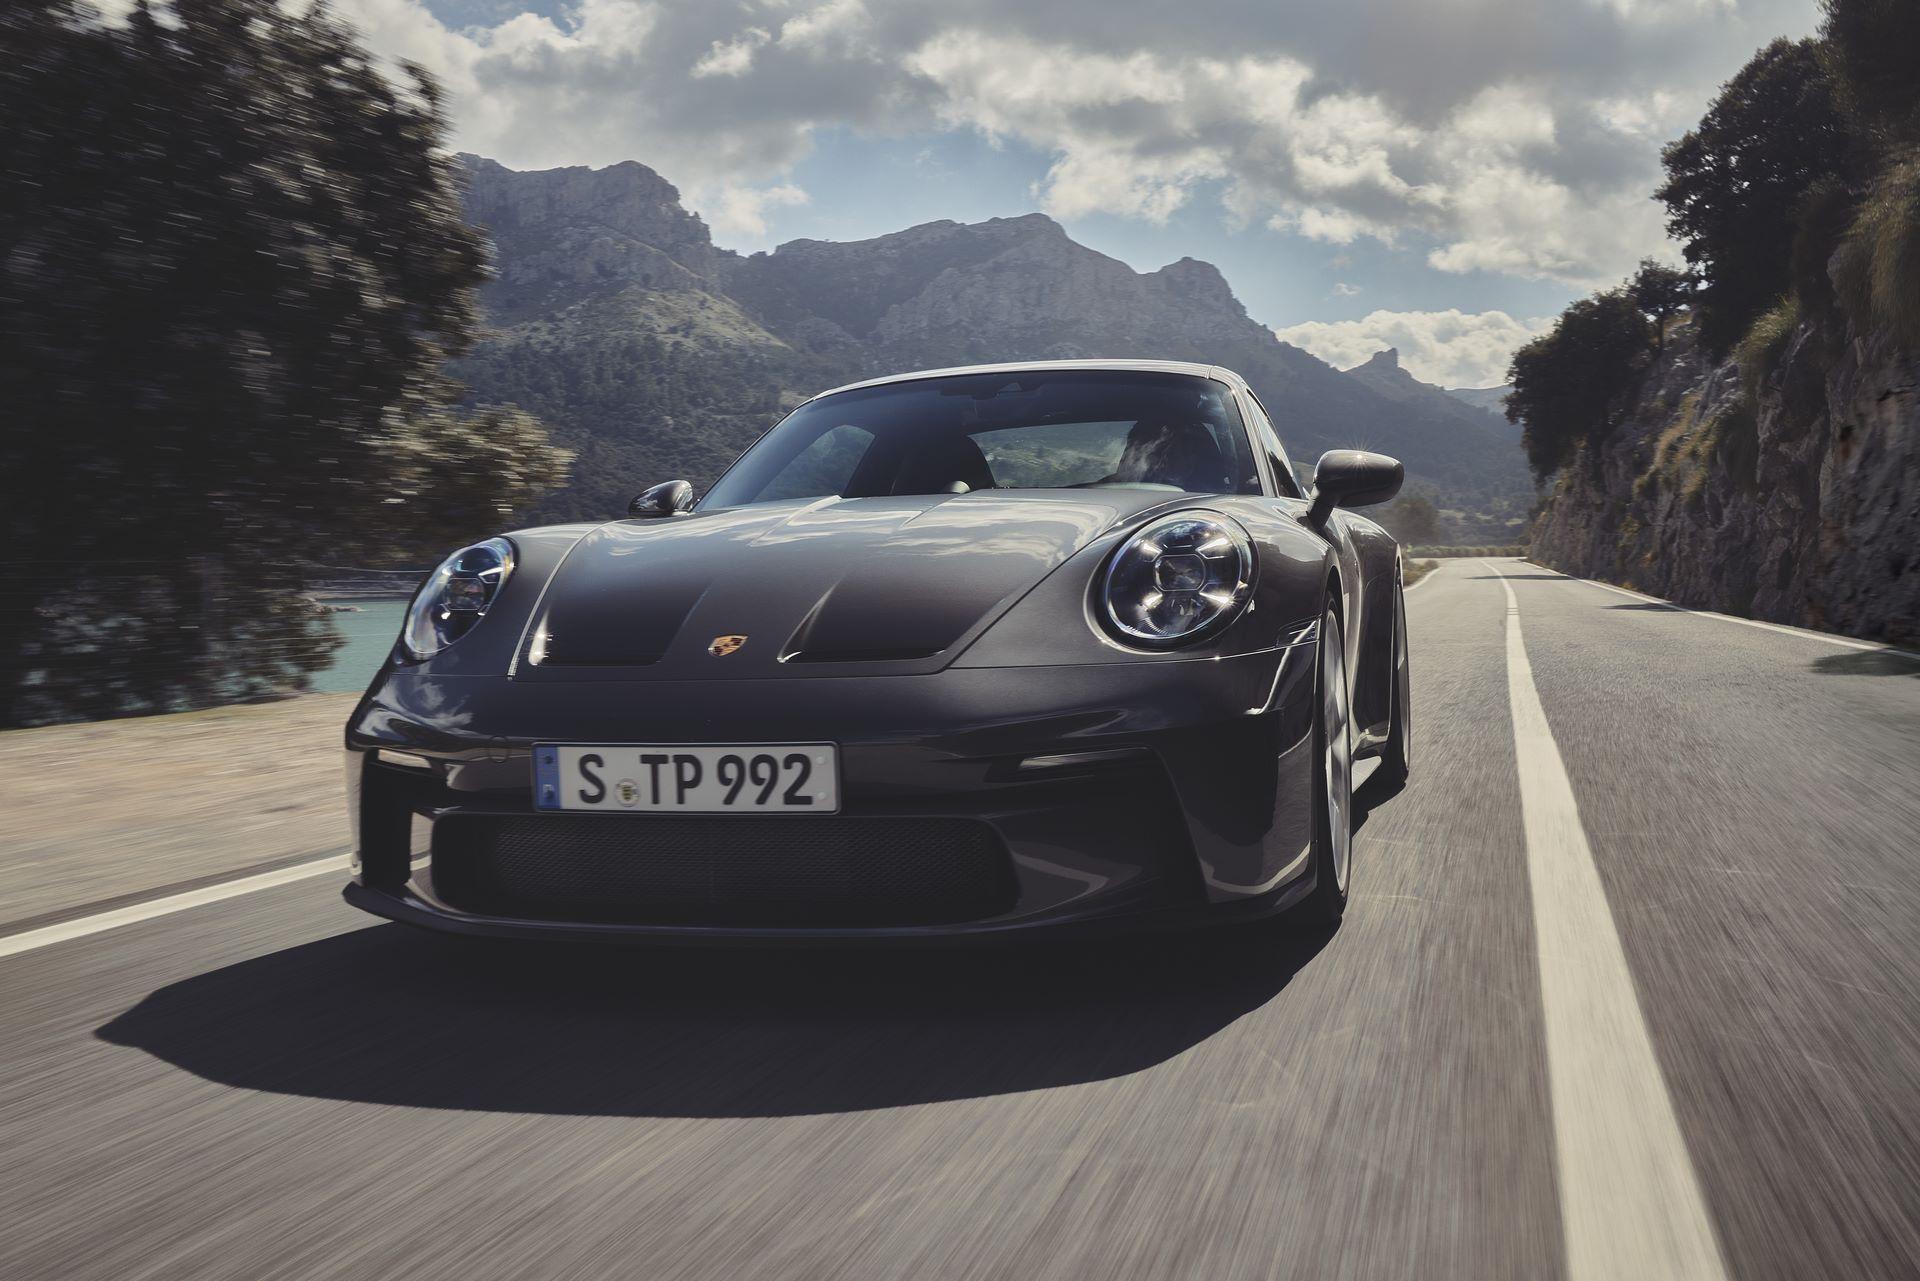 Porsche-911-GT3-Touring-Package-18